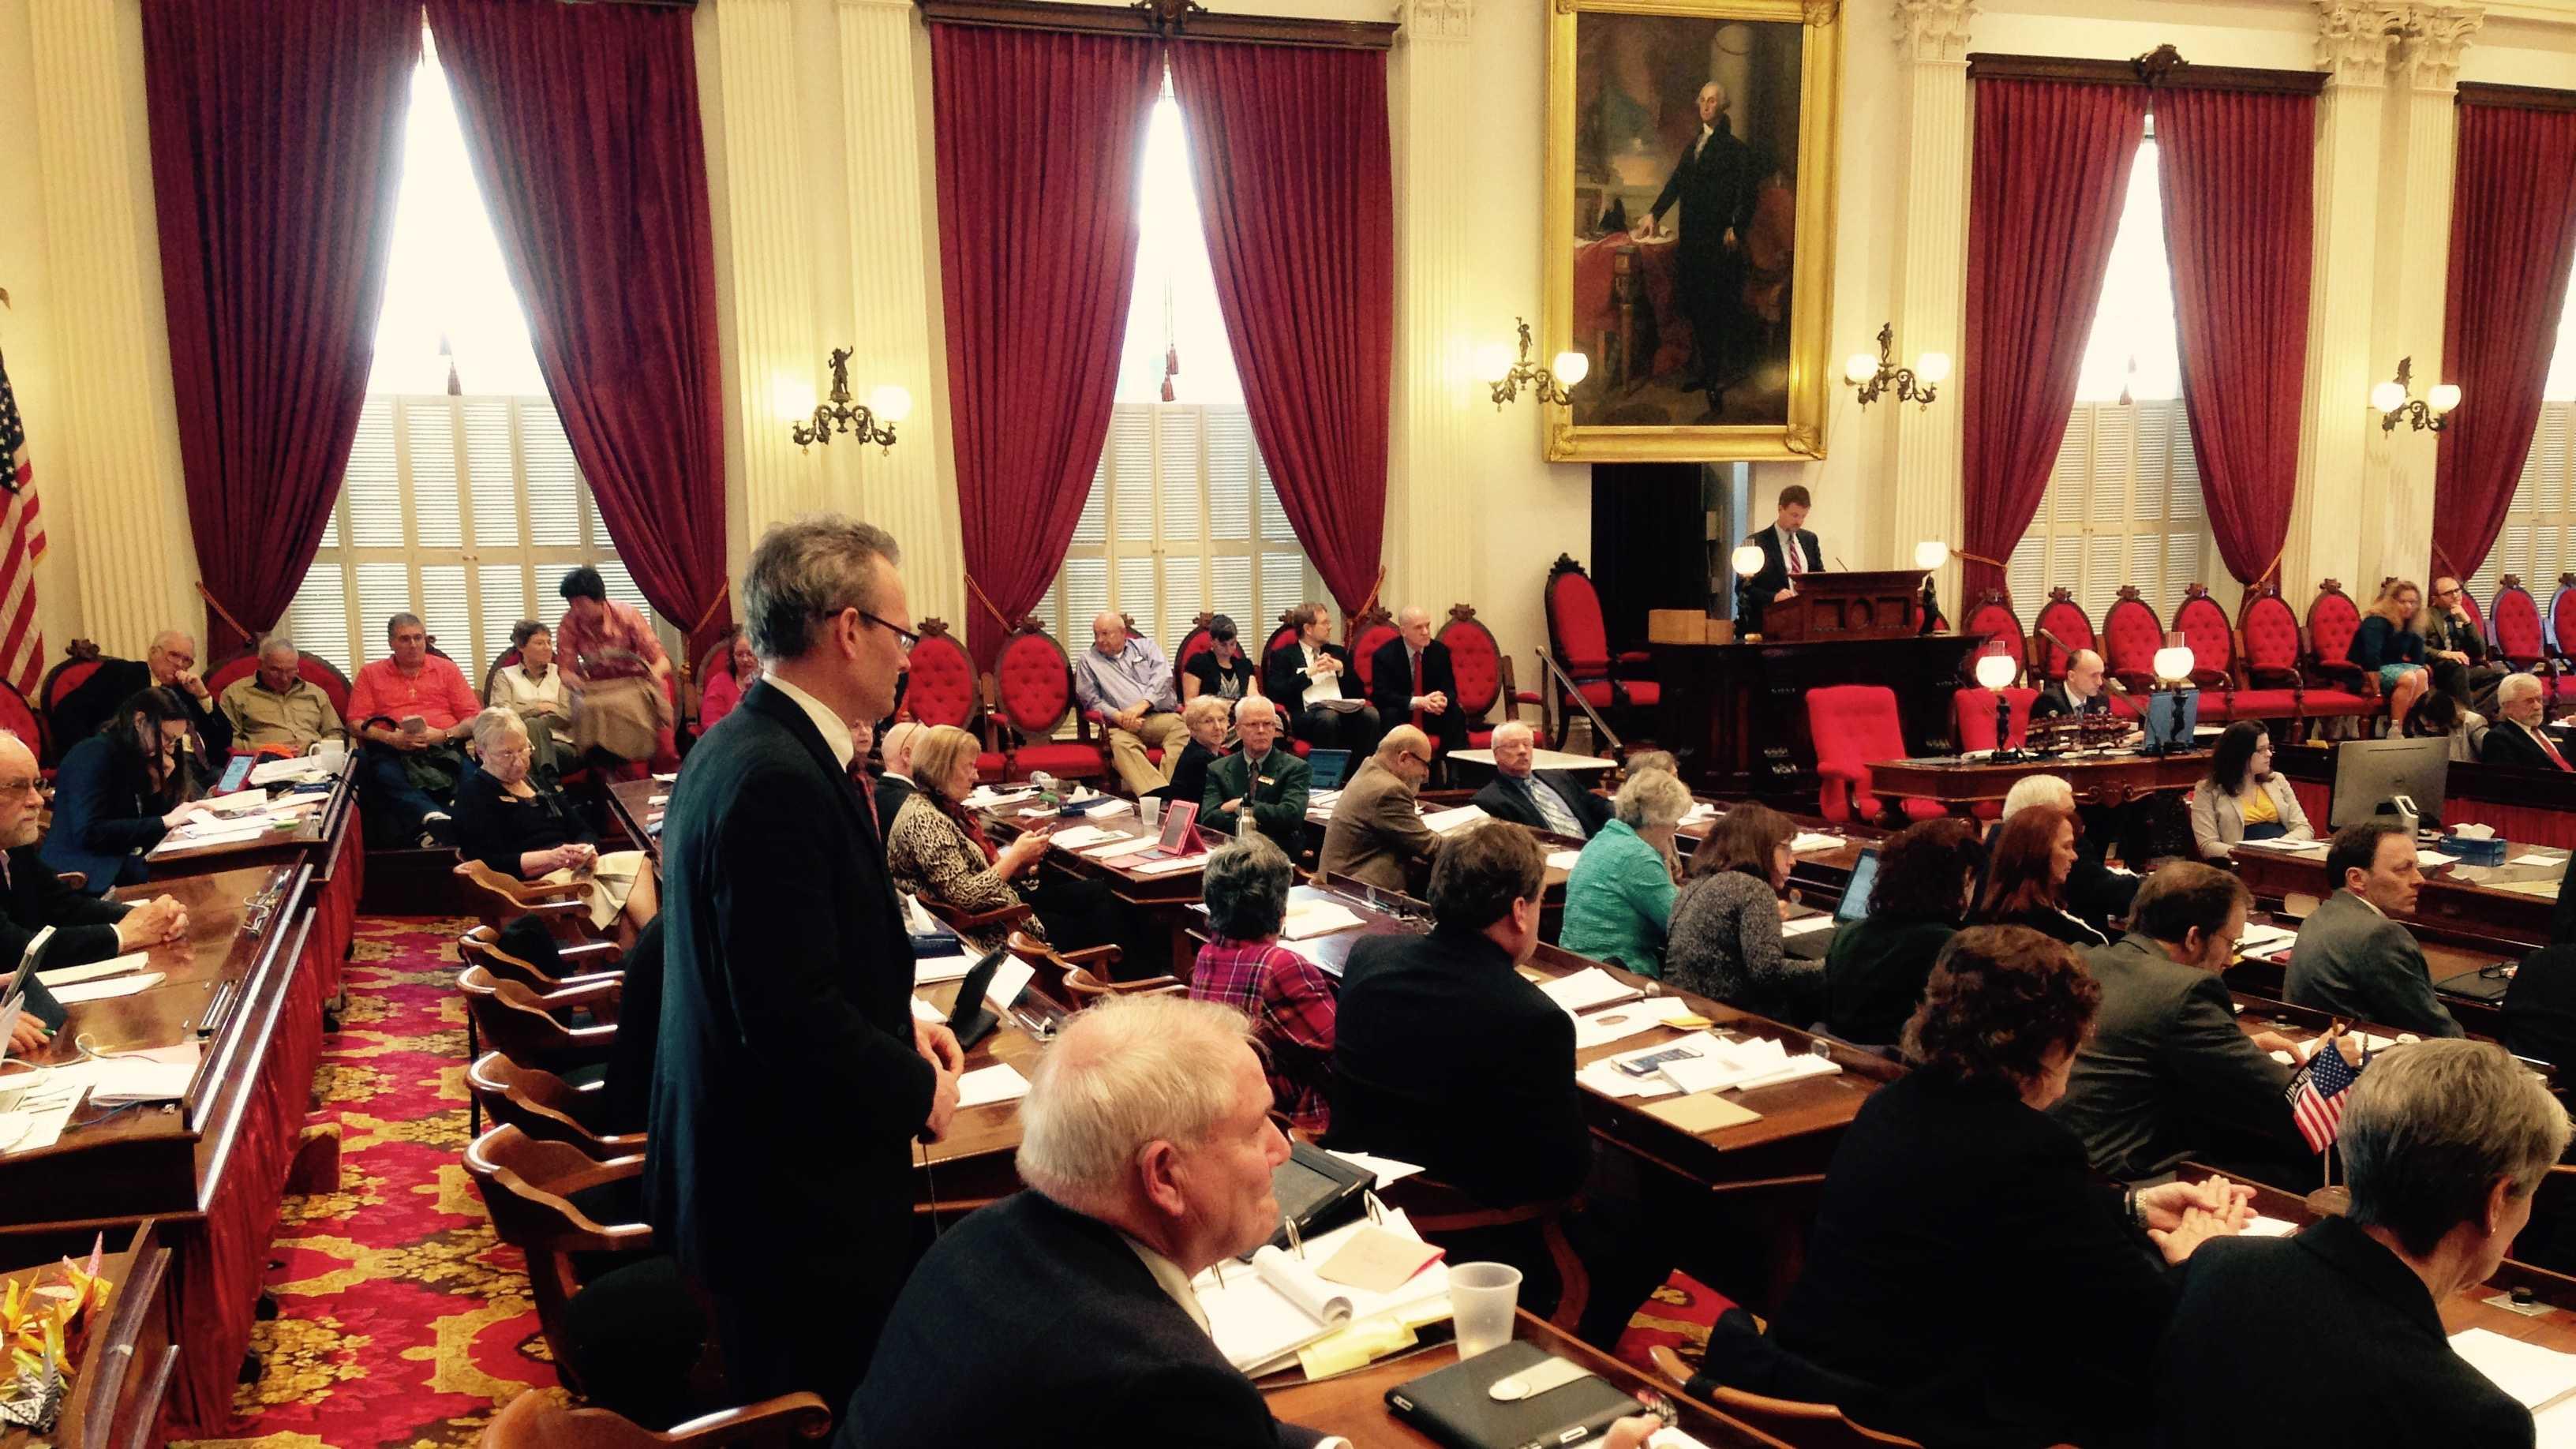 Rep. Willem Jewett (D-Ripton) argues in favor of the gun bill on the House floor Thursday.